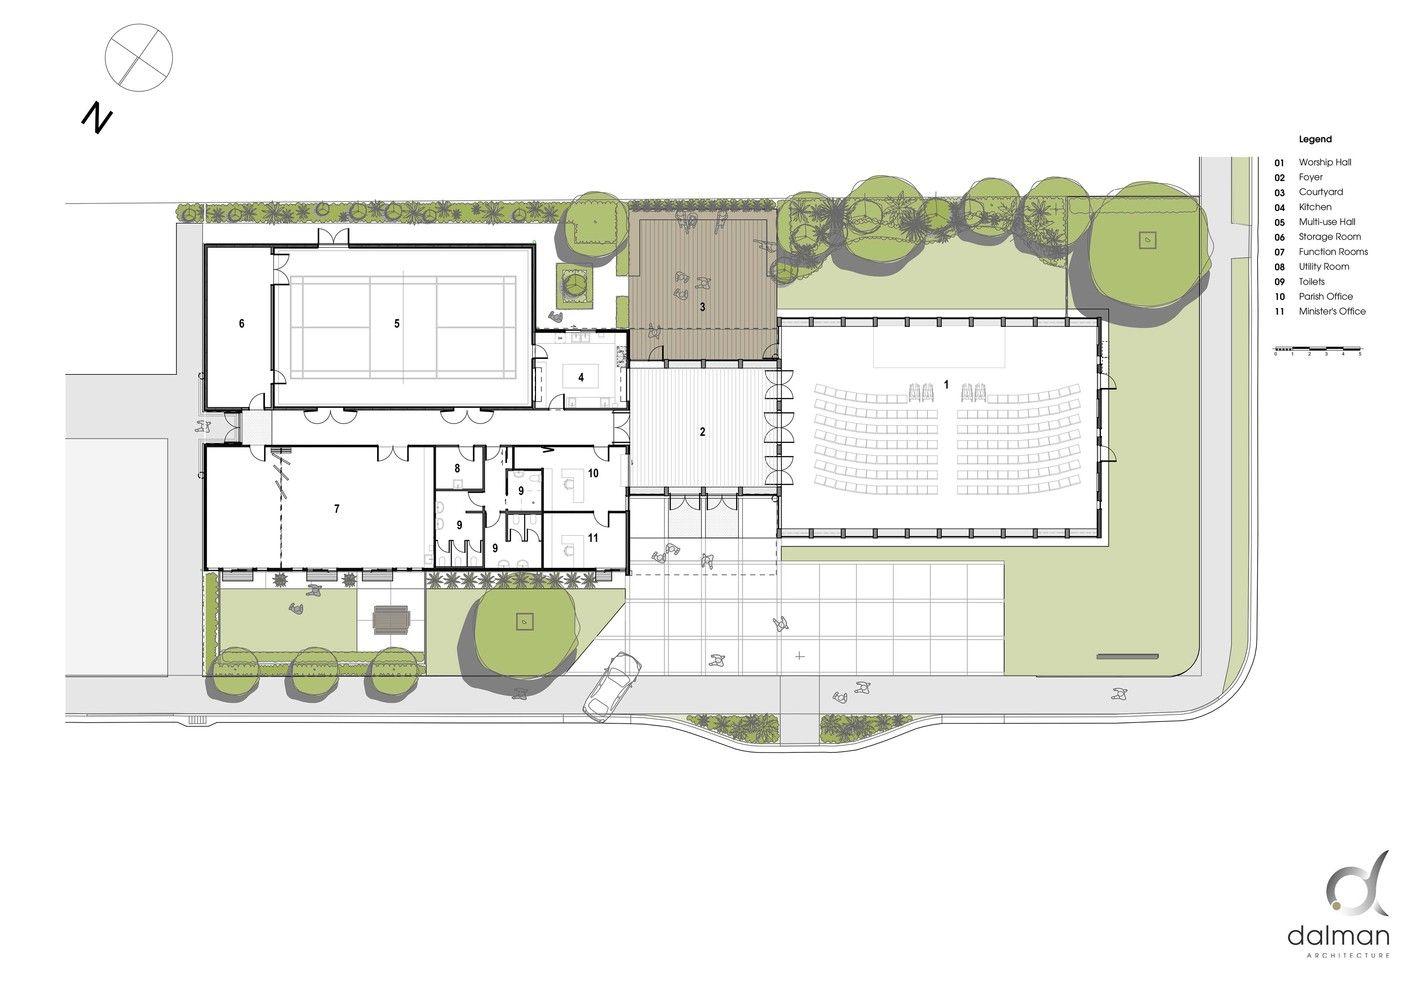 Christchurch North Methodist Church Floor Plan Church Design Church Architecture Methodist Church